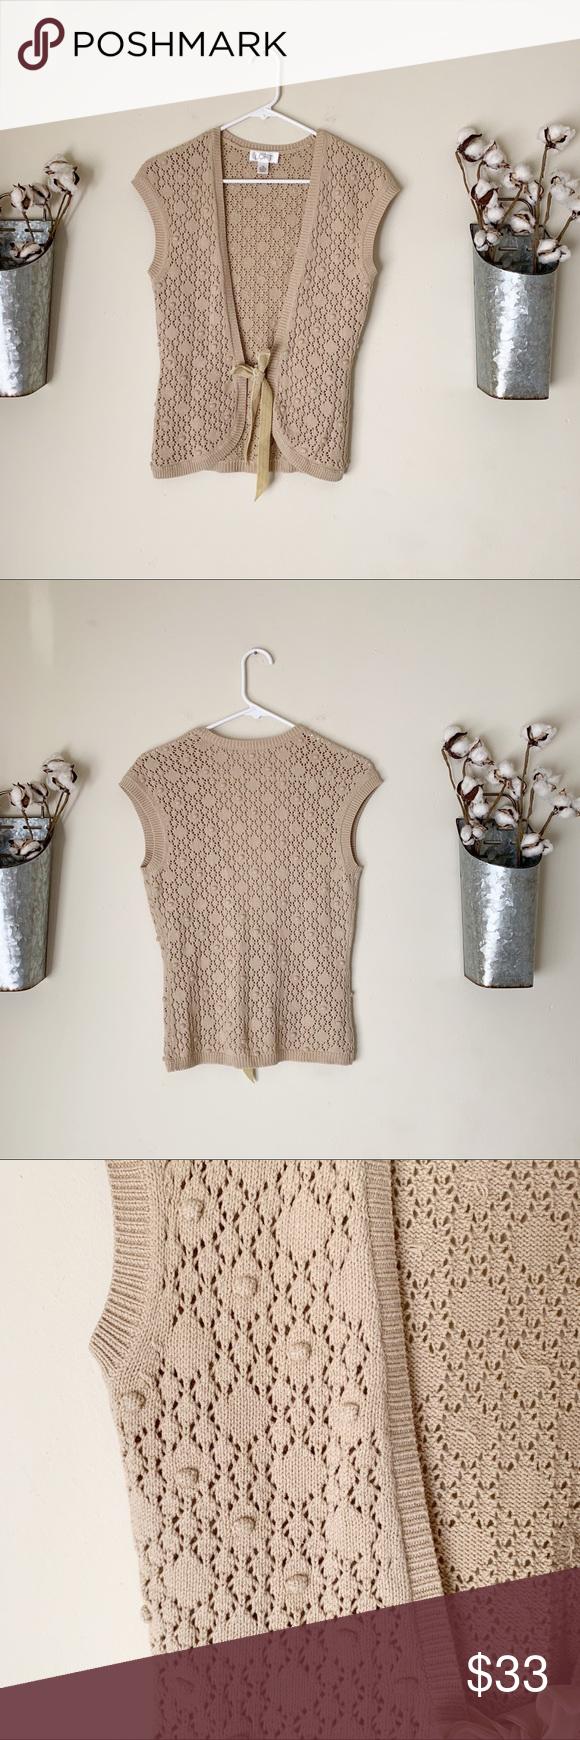 Ann Taylor Loft Popcorn Ball Sweater Vest Excellent condition Popcorn ball design Velvet straps Size XS ⭐️No trades ⭐️Reasonable offers welcome! LOFT Sweaters #popcornballs